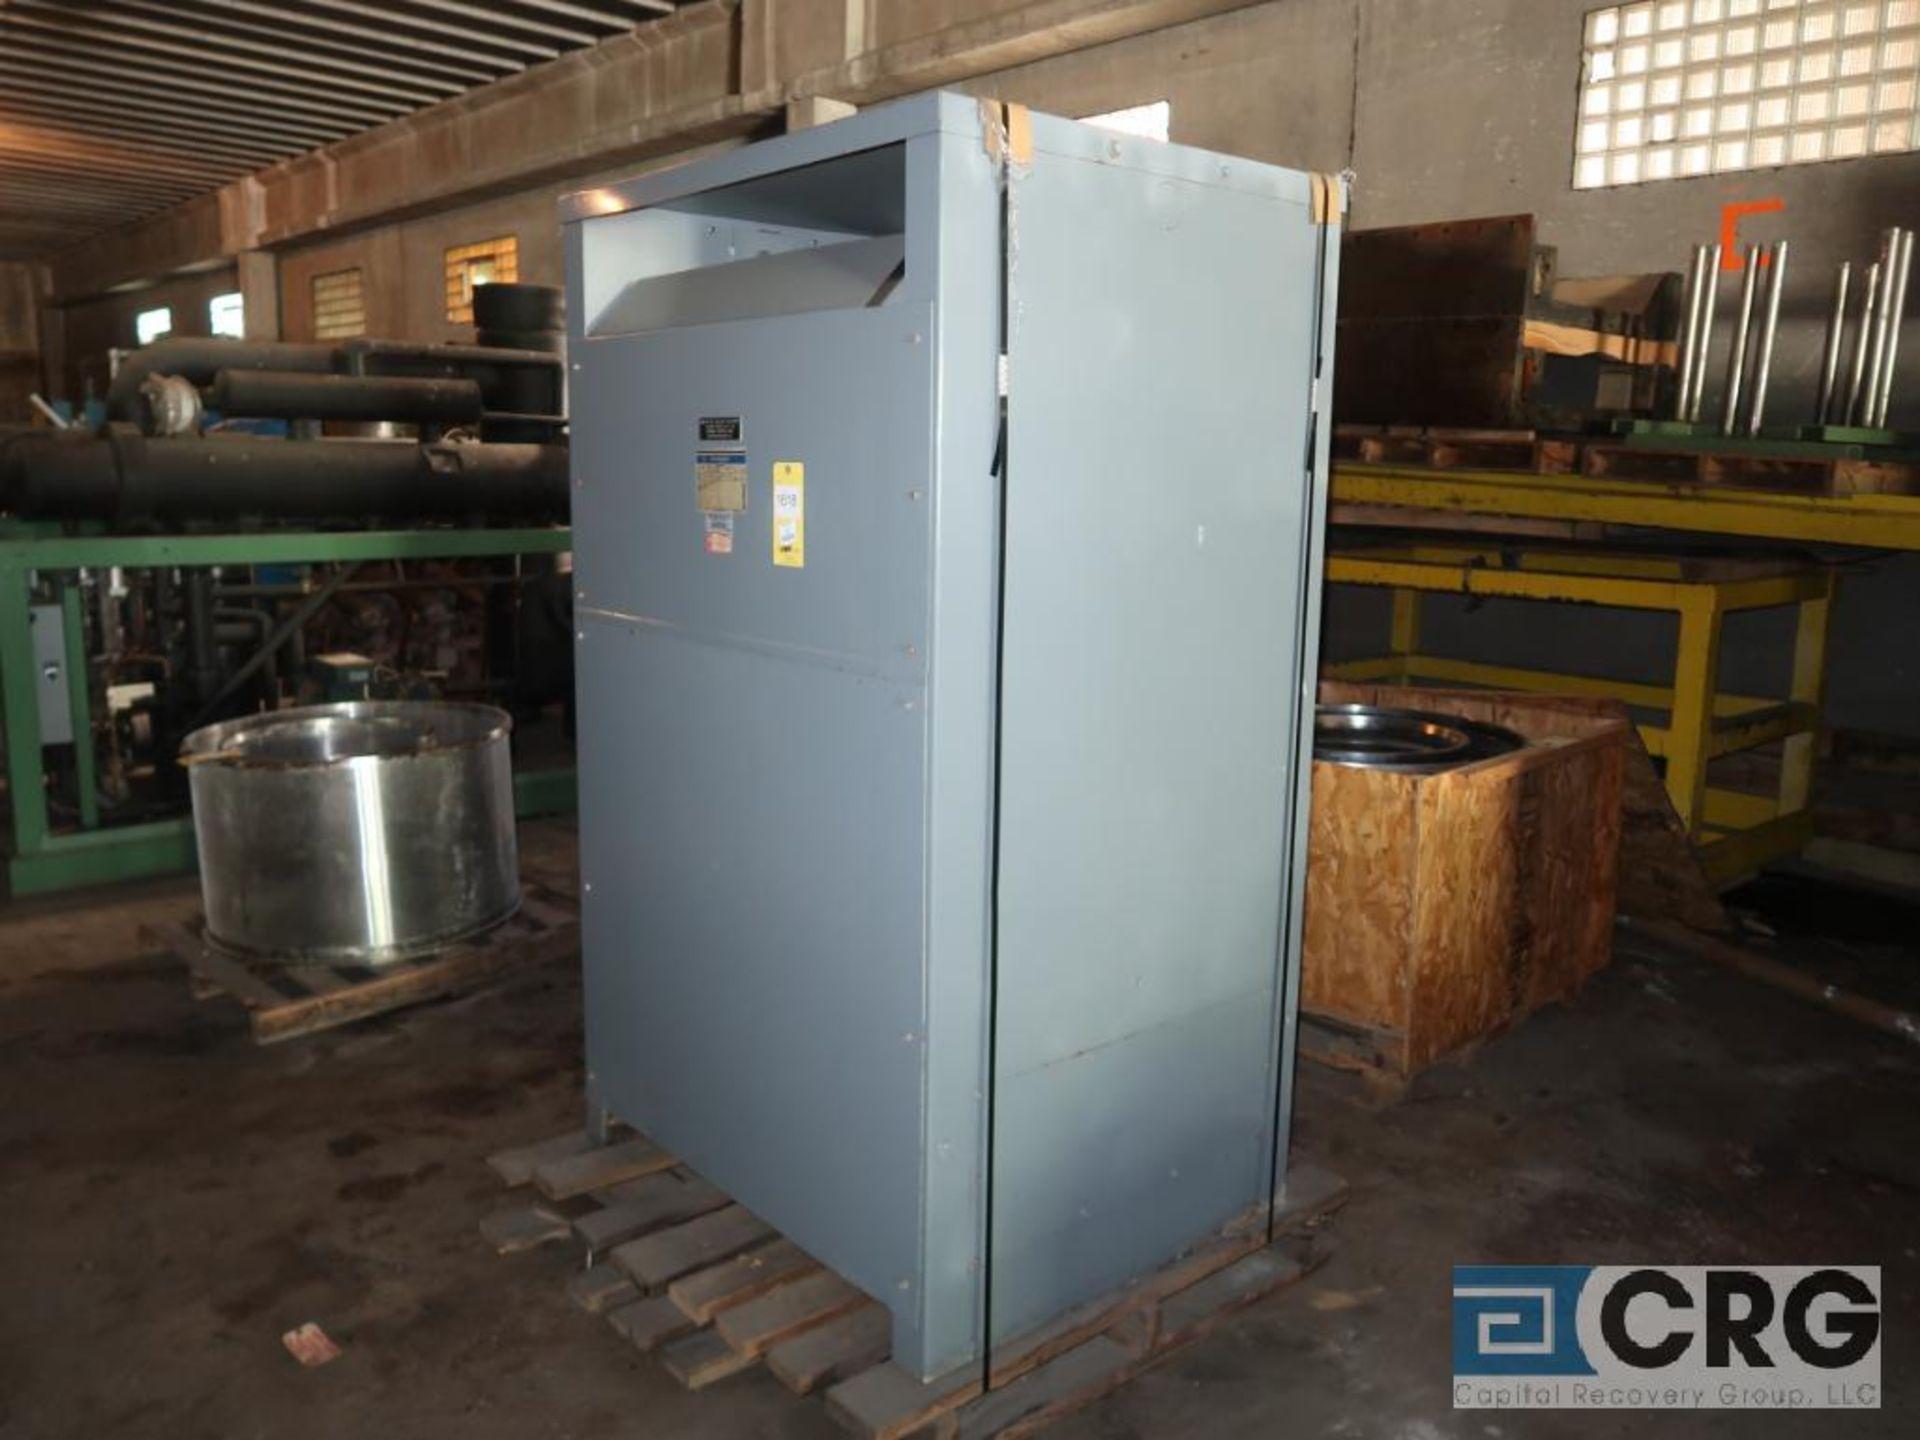 Westinghouse motor drive isolation transformer, 440 KVA, 3 ph., 2,300/480 volt, s/n 12410 (Off